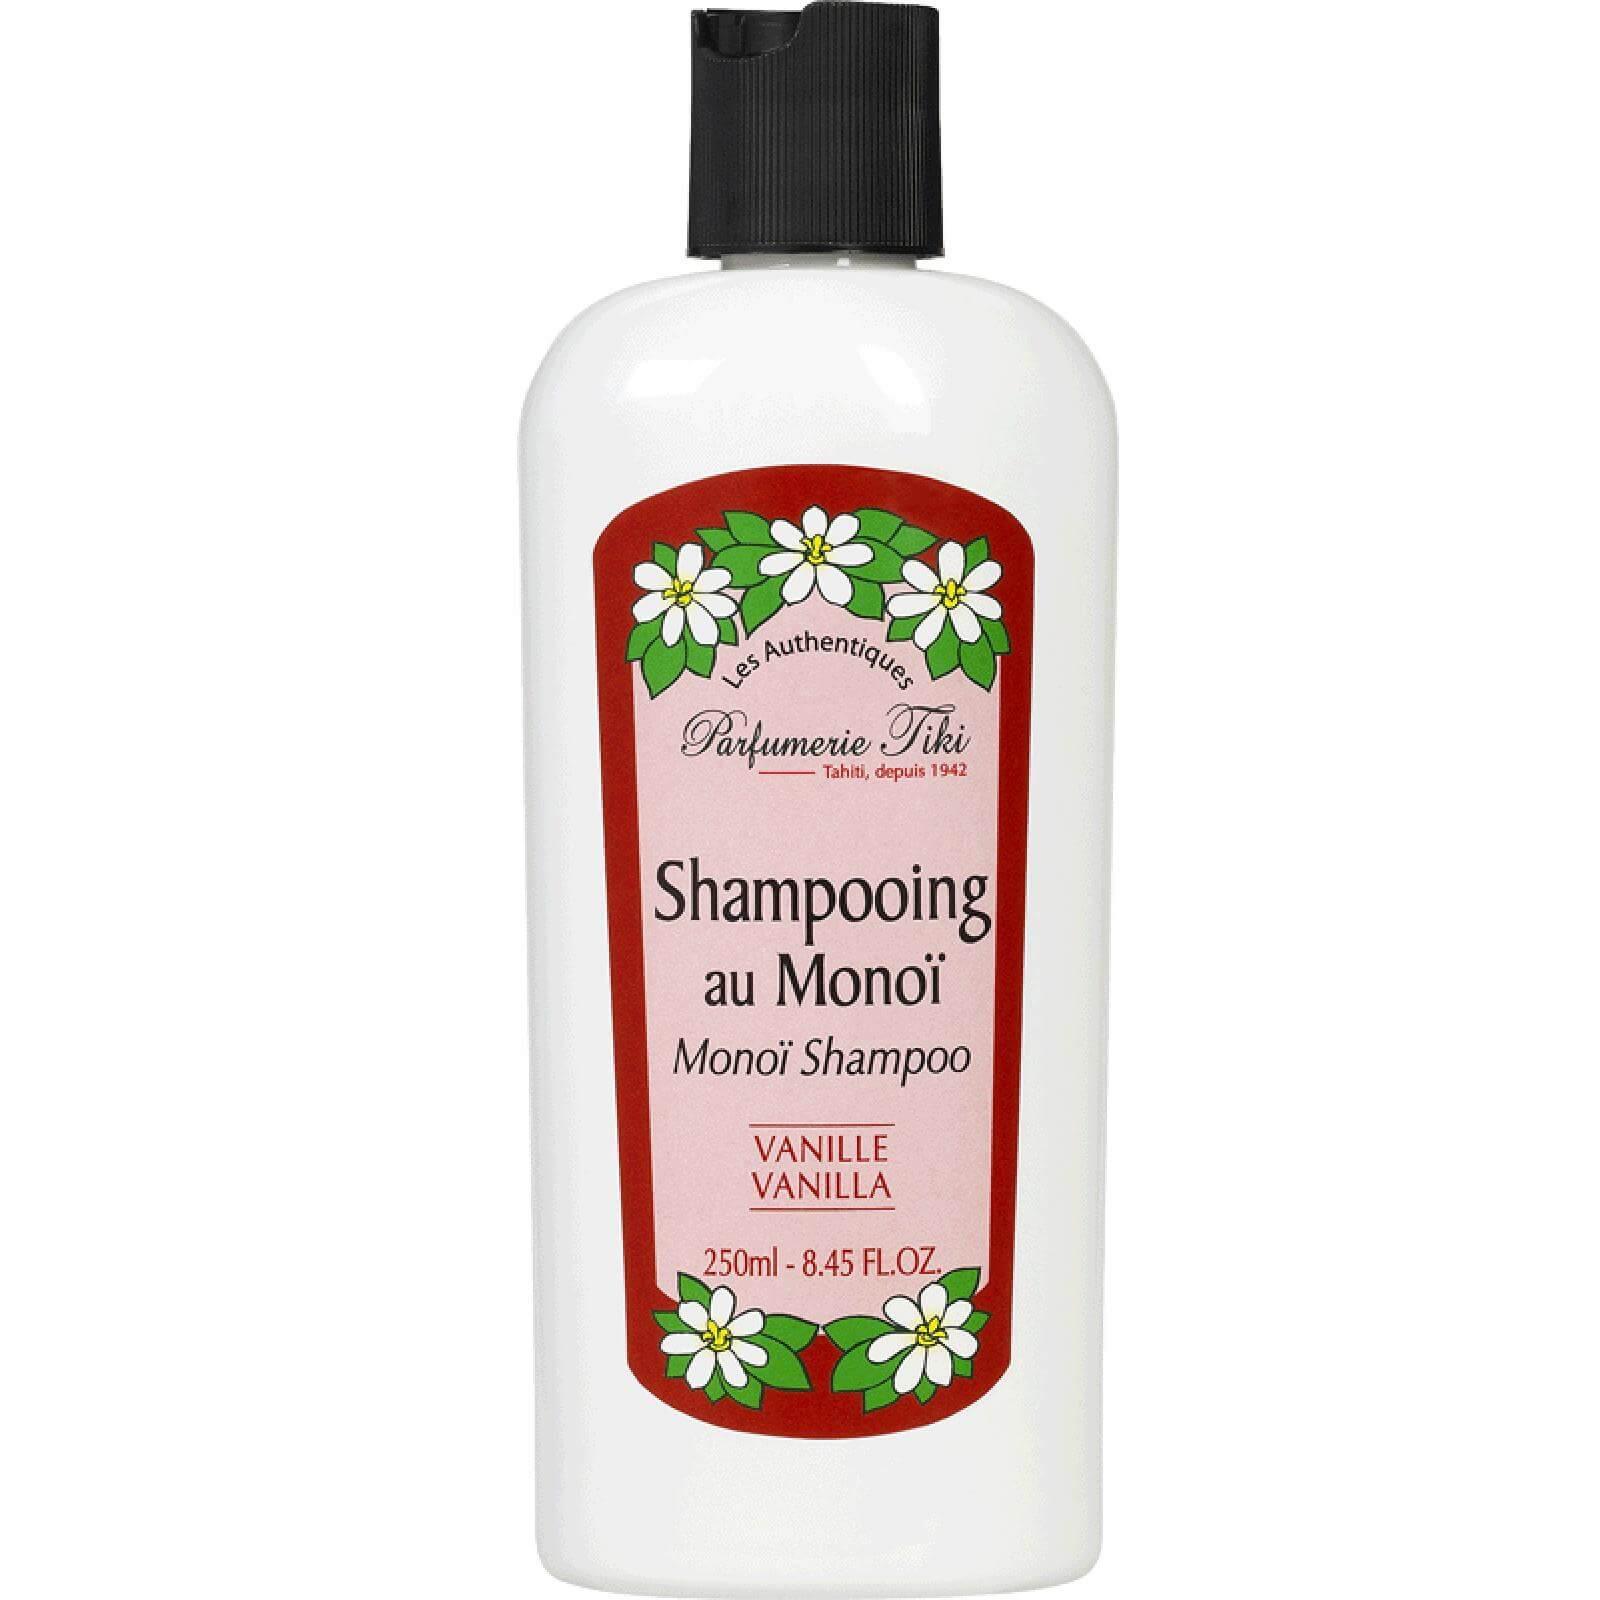 Monoi TikiShampooing Au Monoi Σαμπουάνγια Ξηρά/Κατεστραμμένα Μαλλιάμε Άρωμα Βανίλιας 250ml